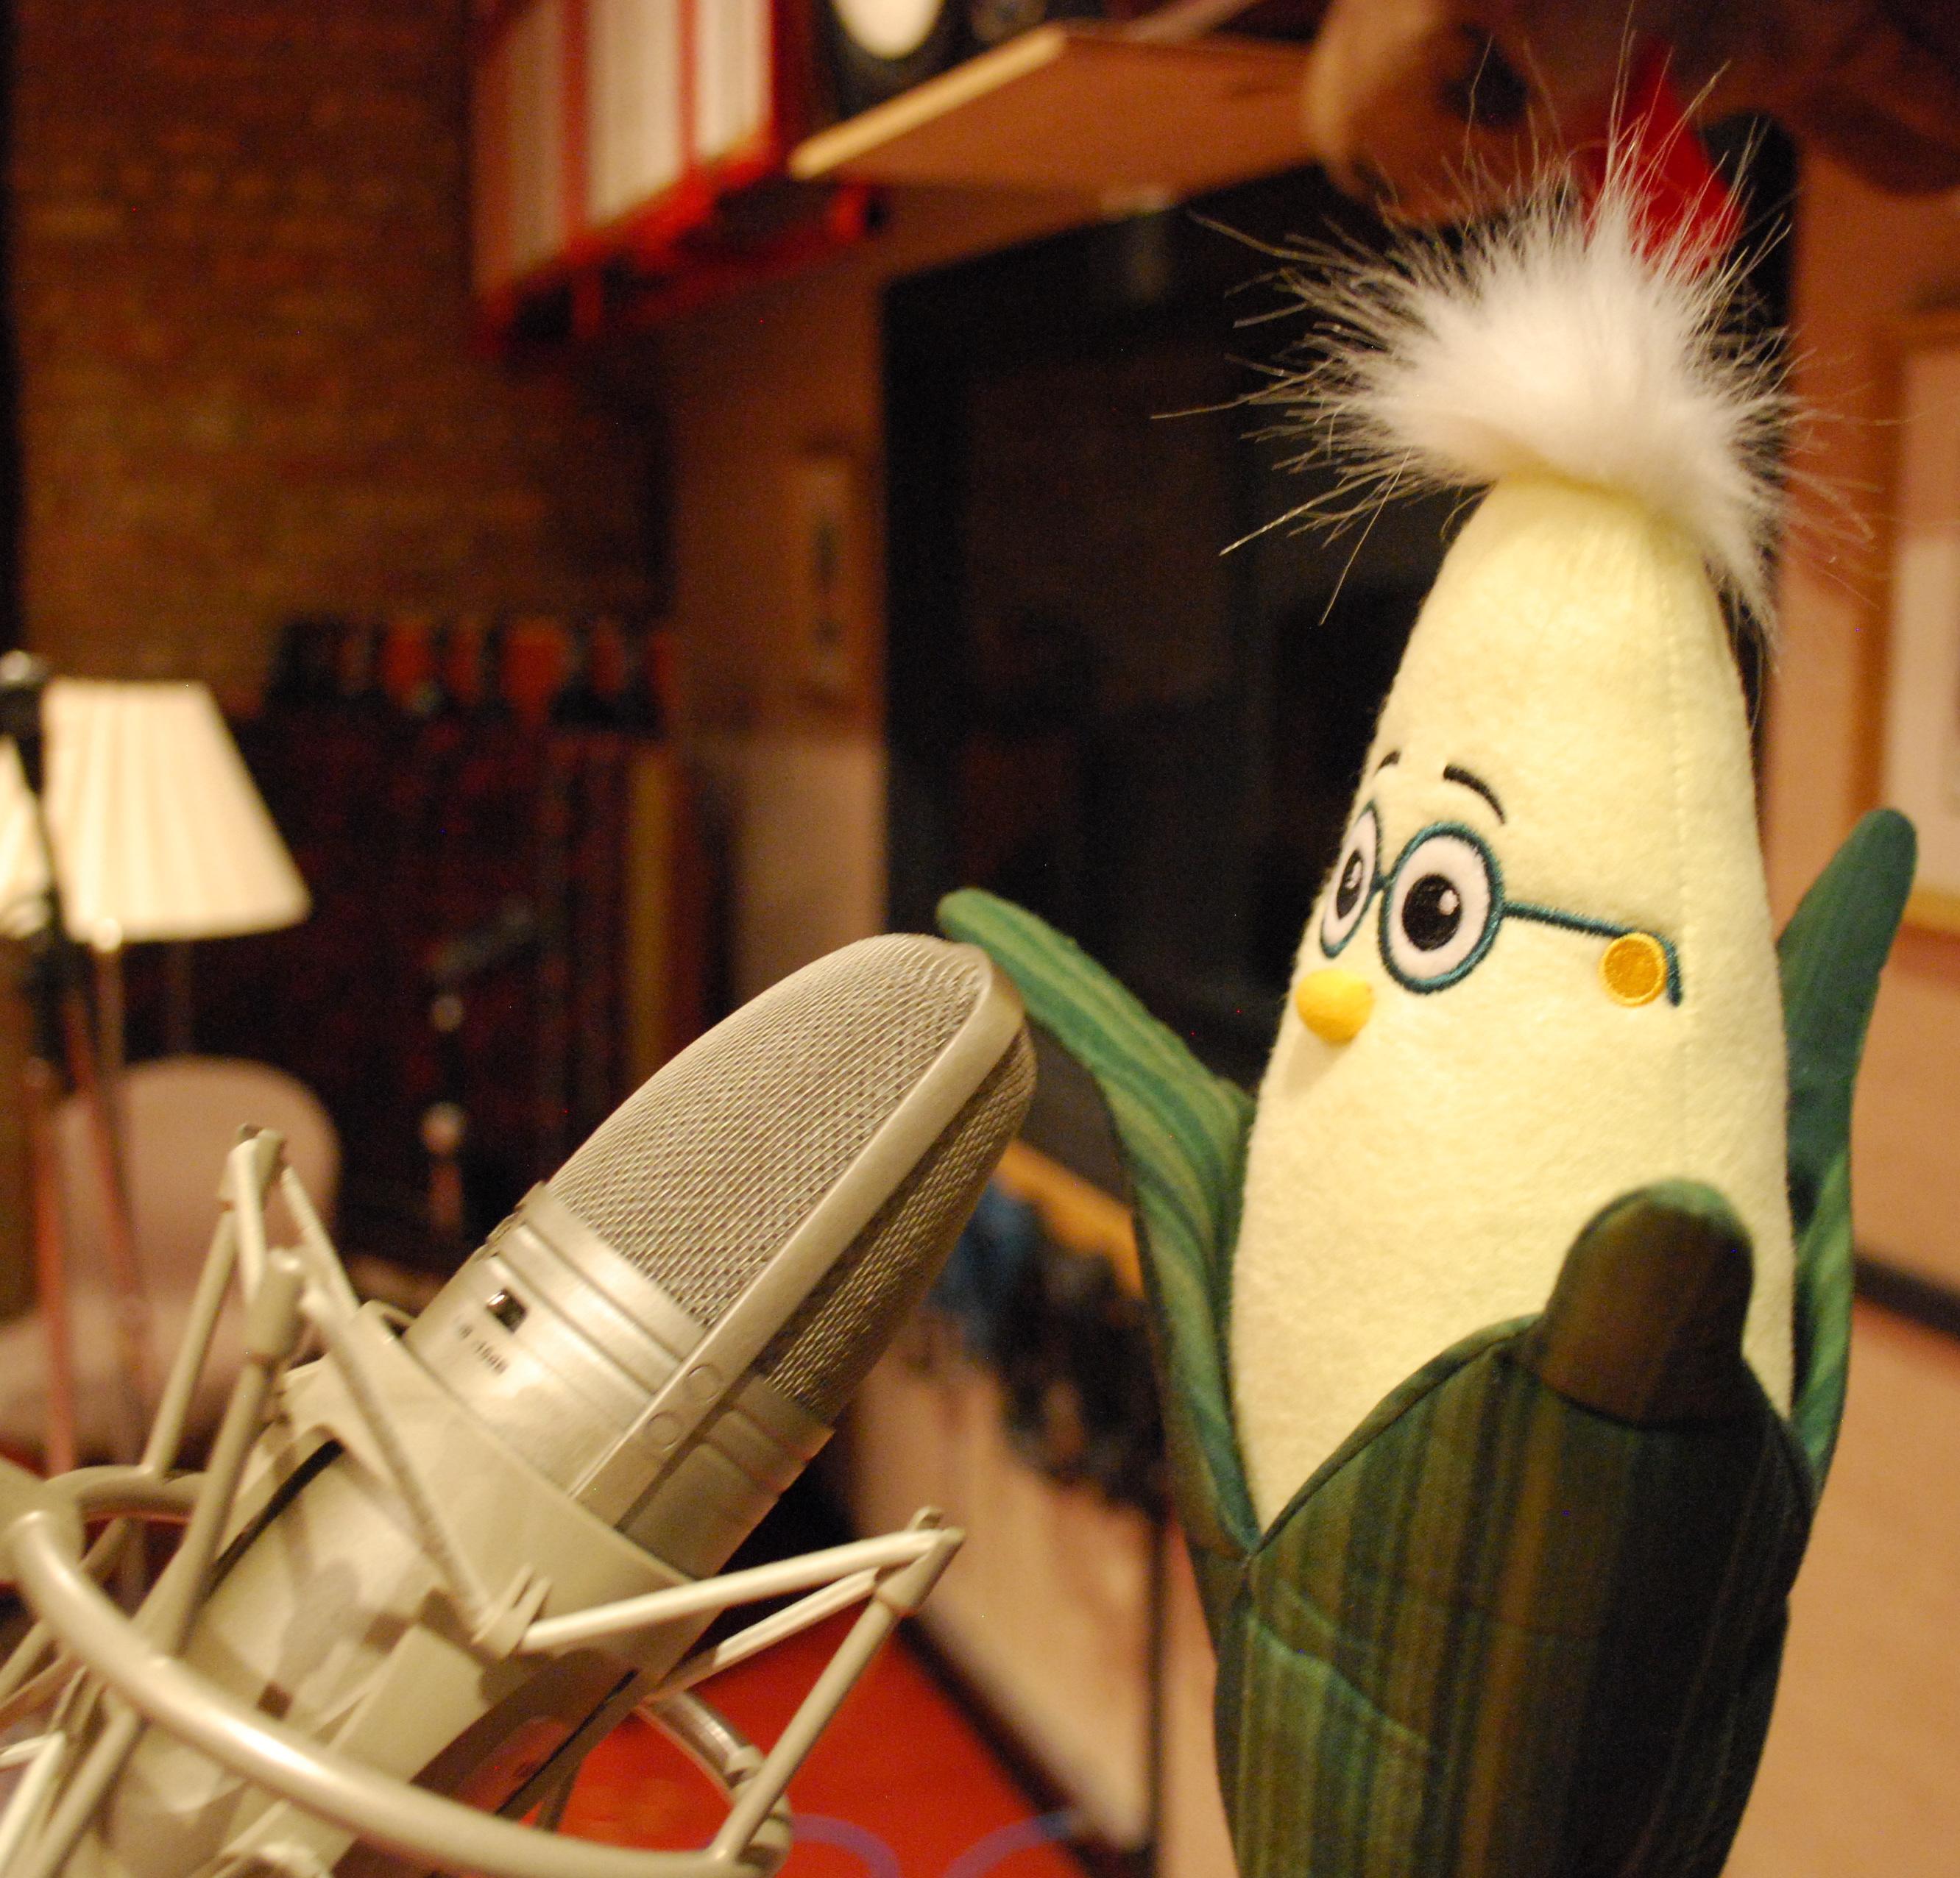 Frank microphone